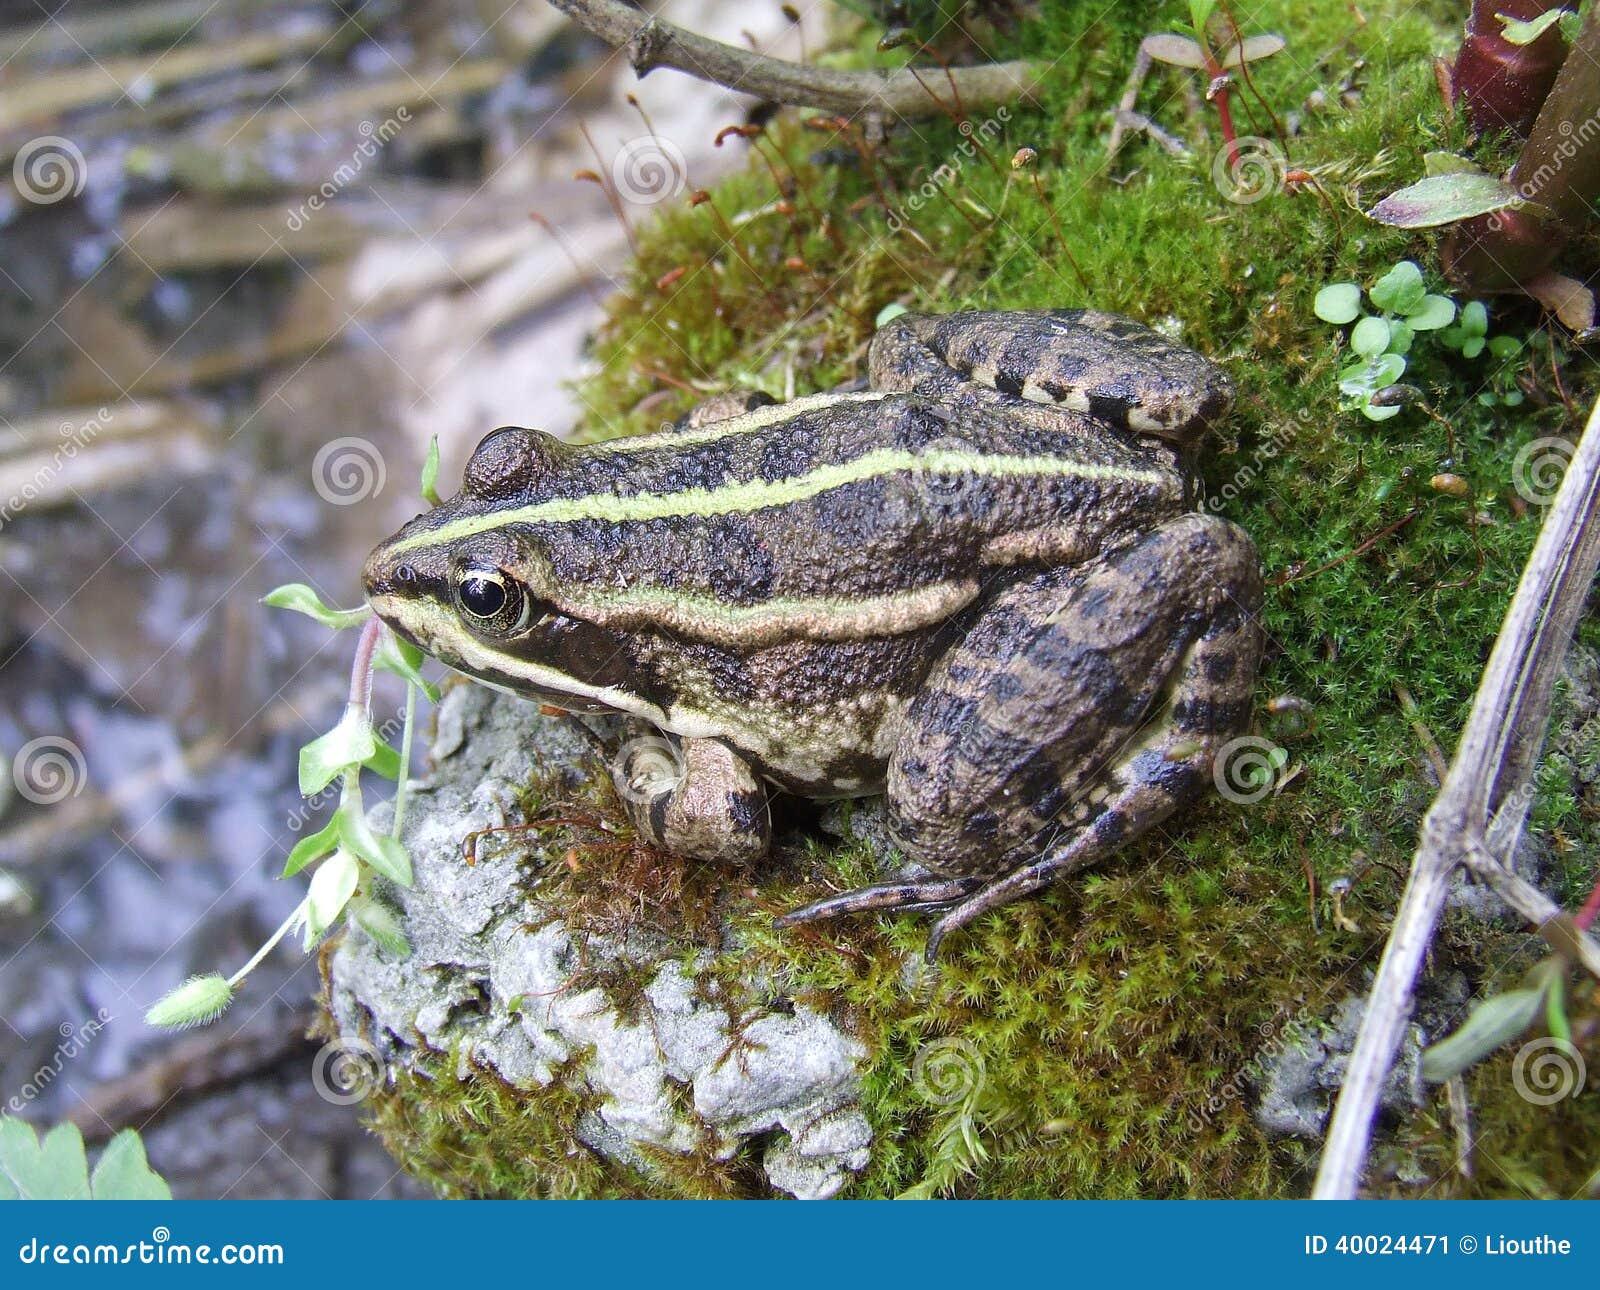 Small marsh frog